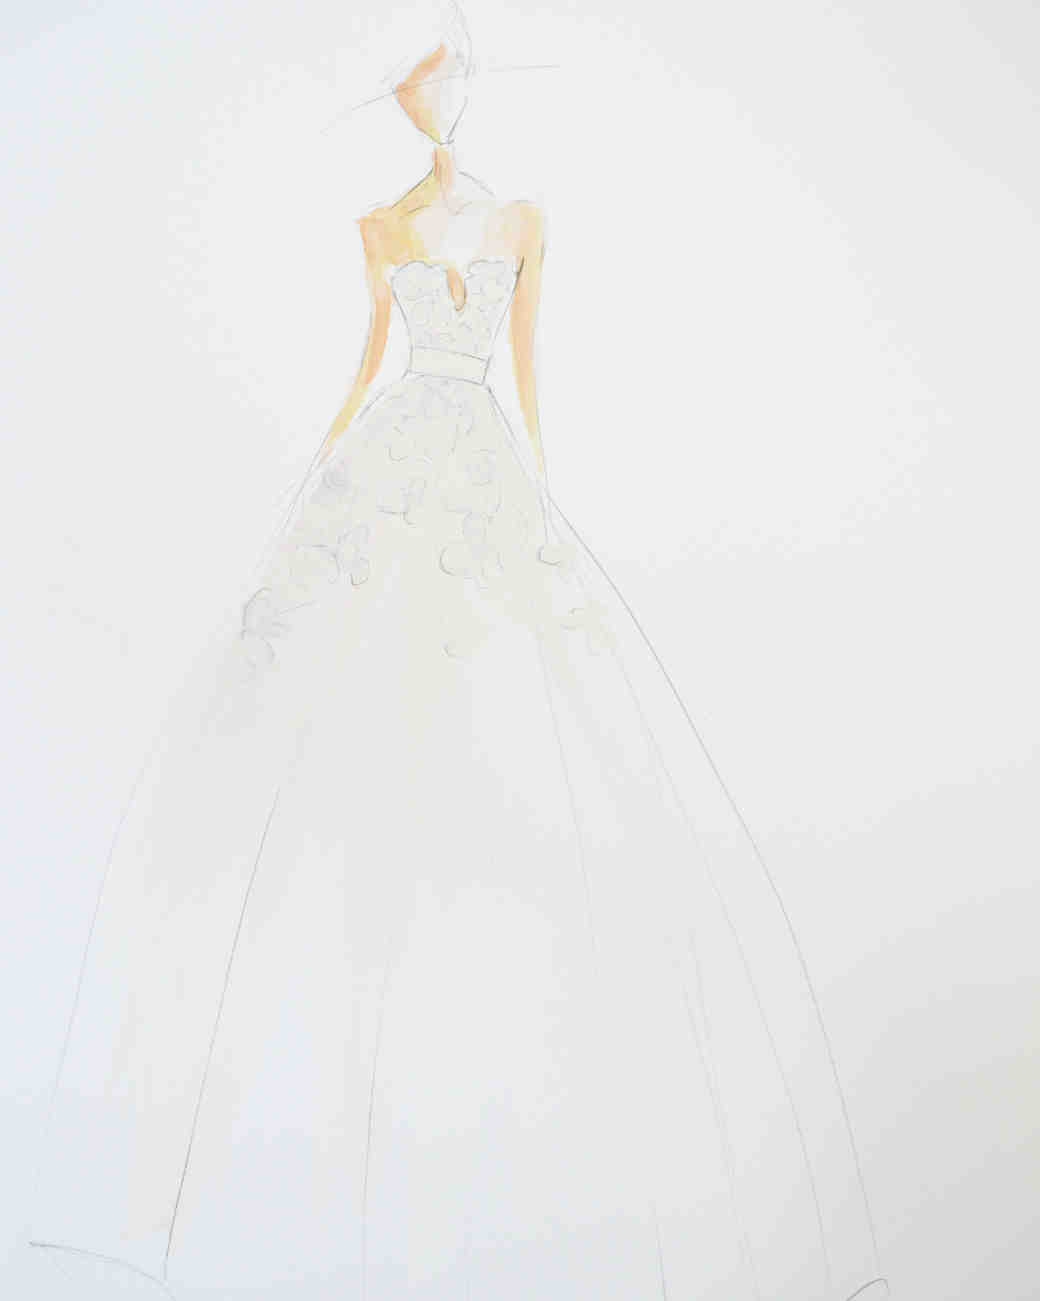 Lela Rose Fall 2017 Exclusive Wedding Dress Sketch